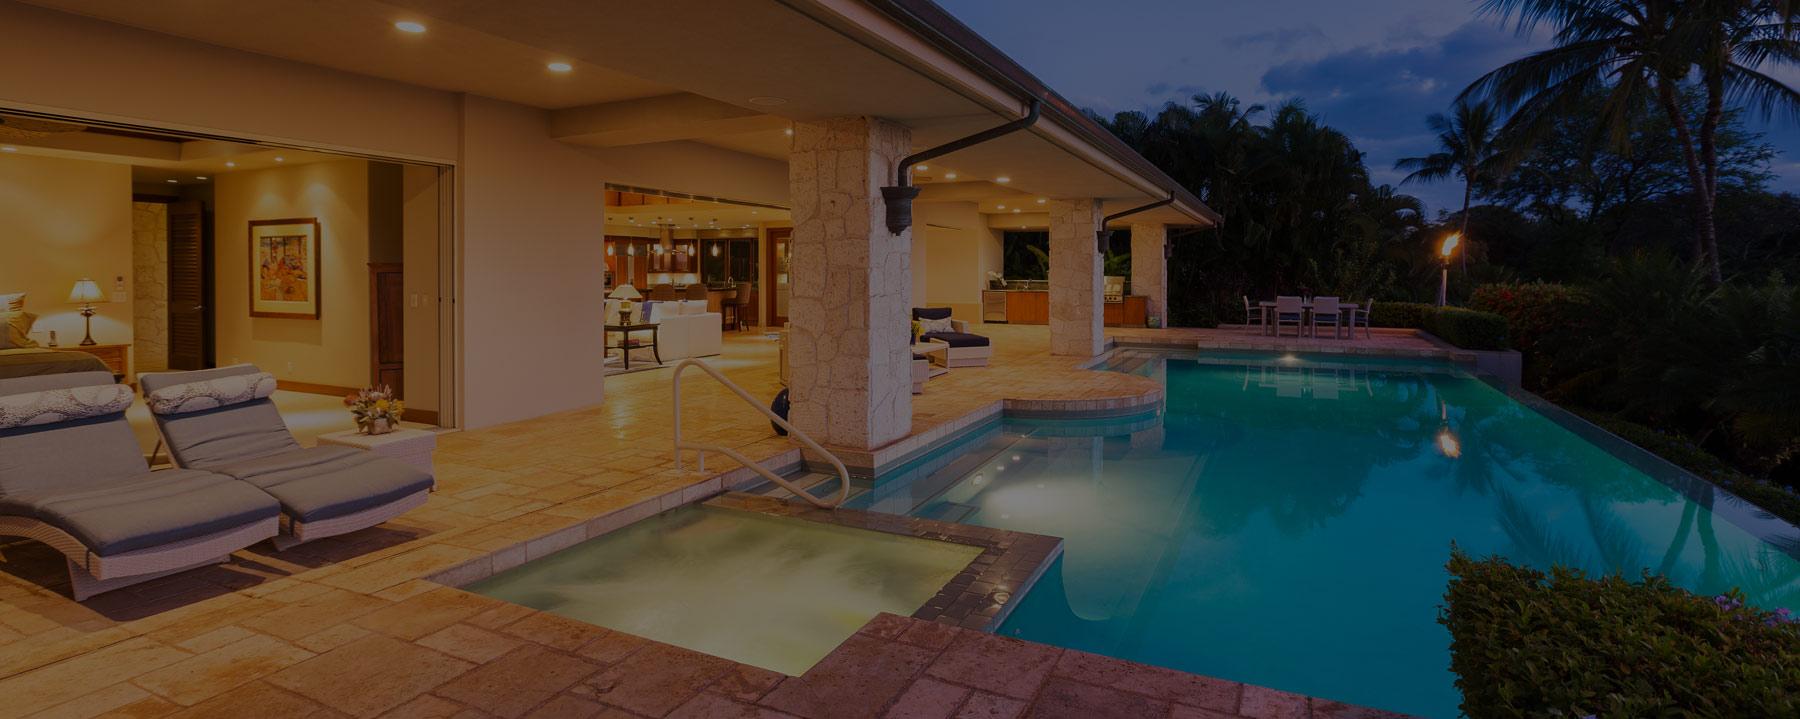 luxury properties from Nesco realty